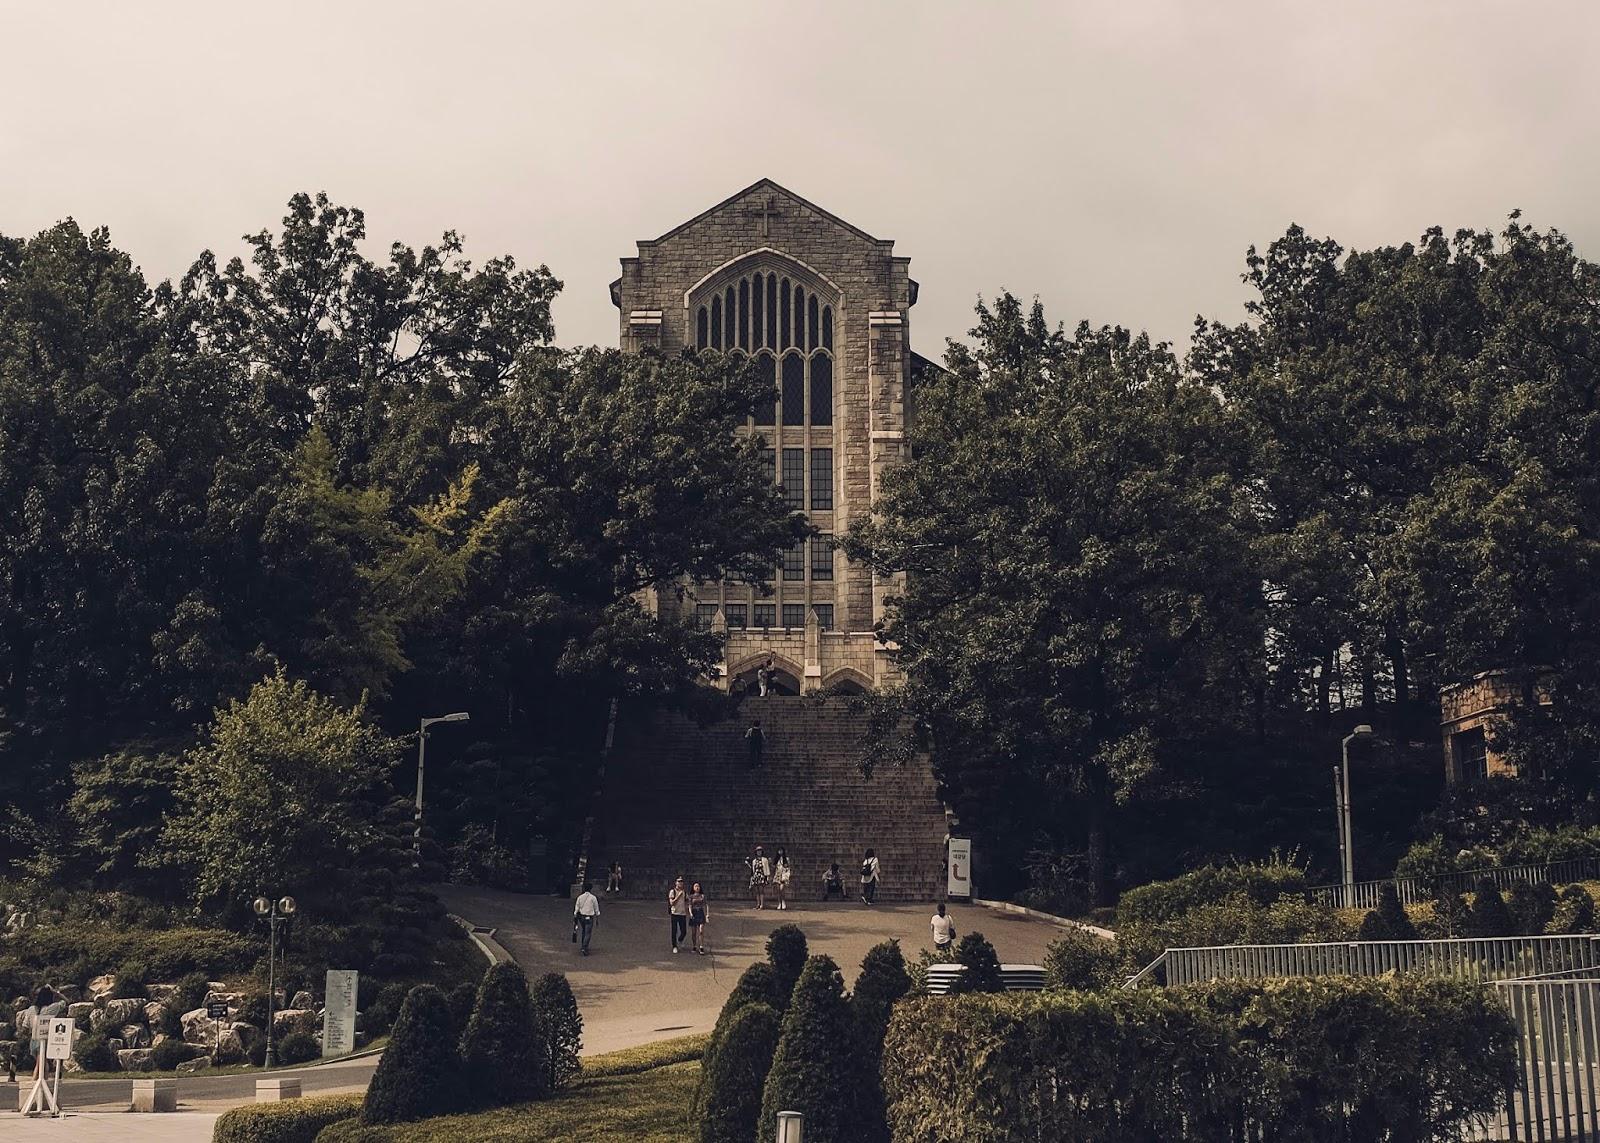 Ehwa Woman's University Seoul Korea Curitan Aqalili